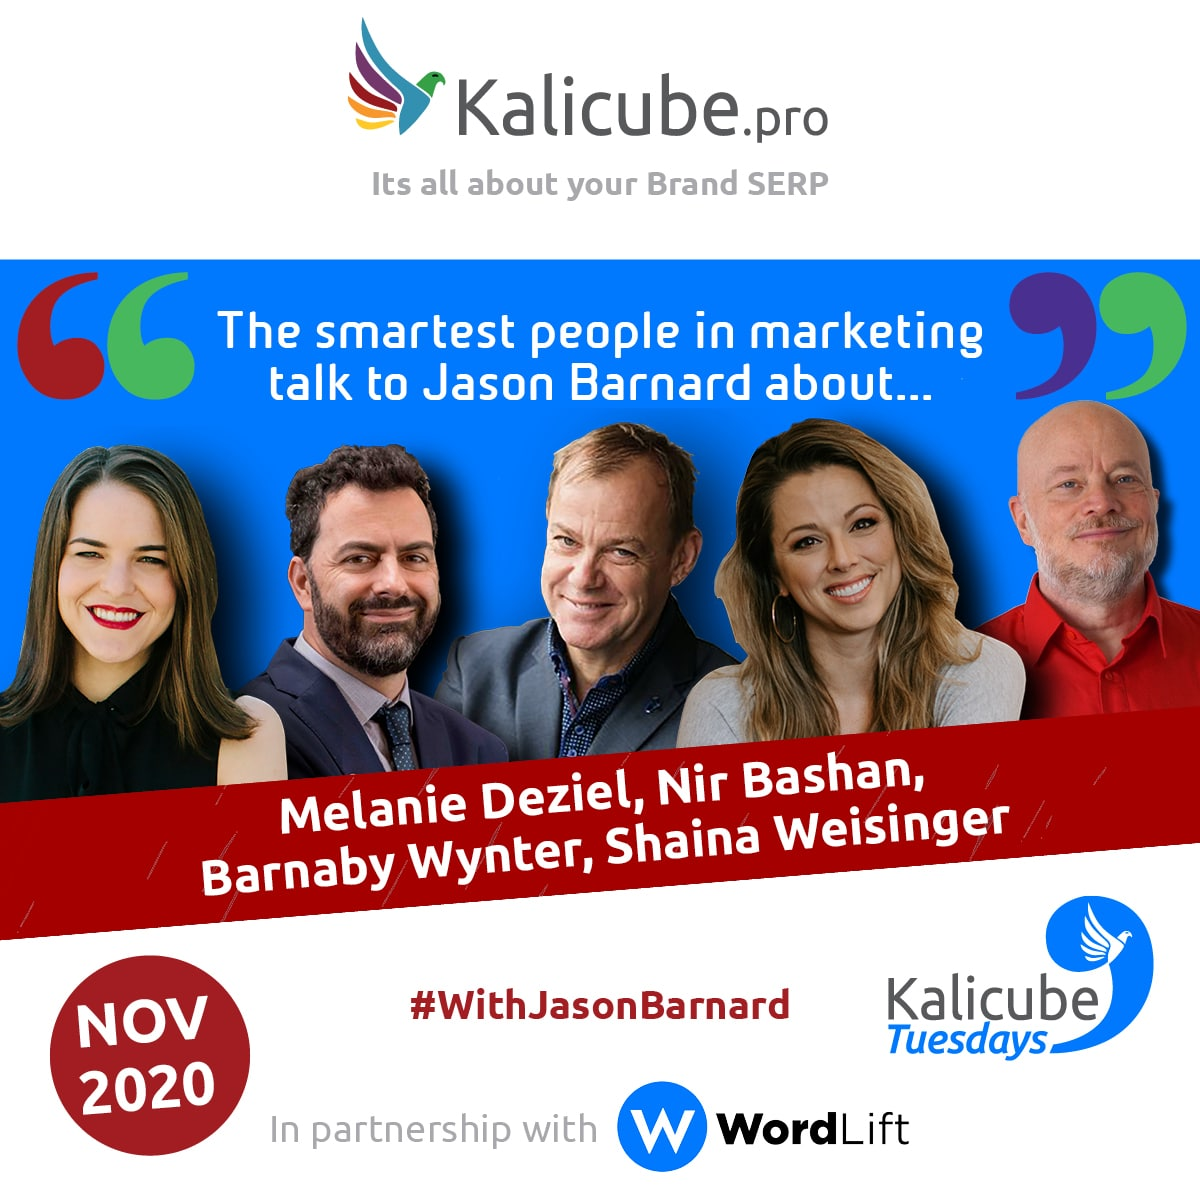 Kalicube Tuesdays November 2020